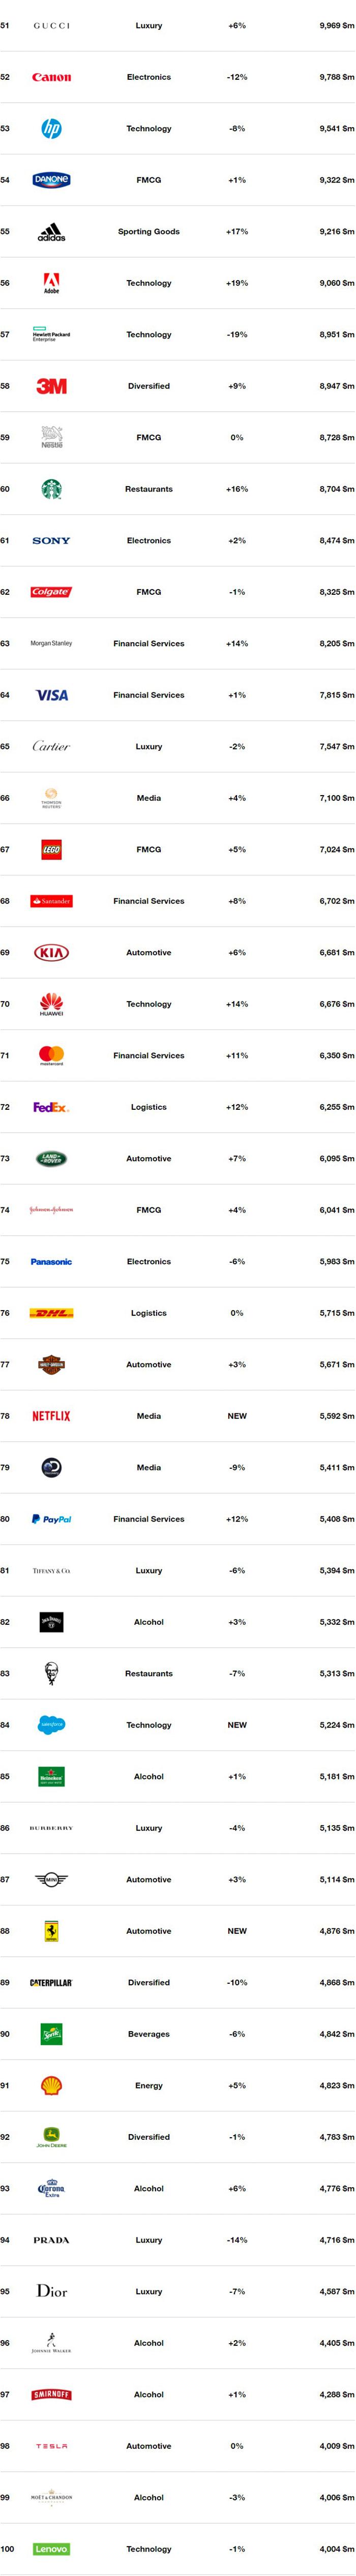 Global-Brands-Report-2017